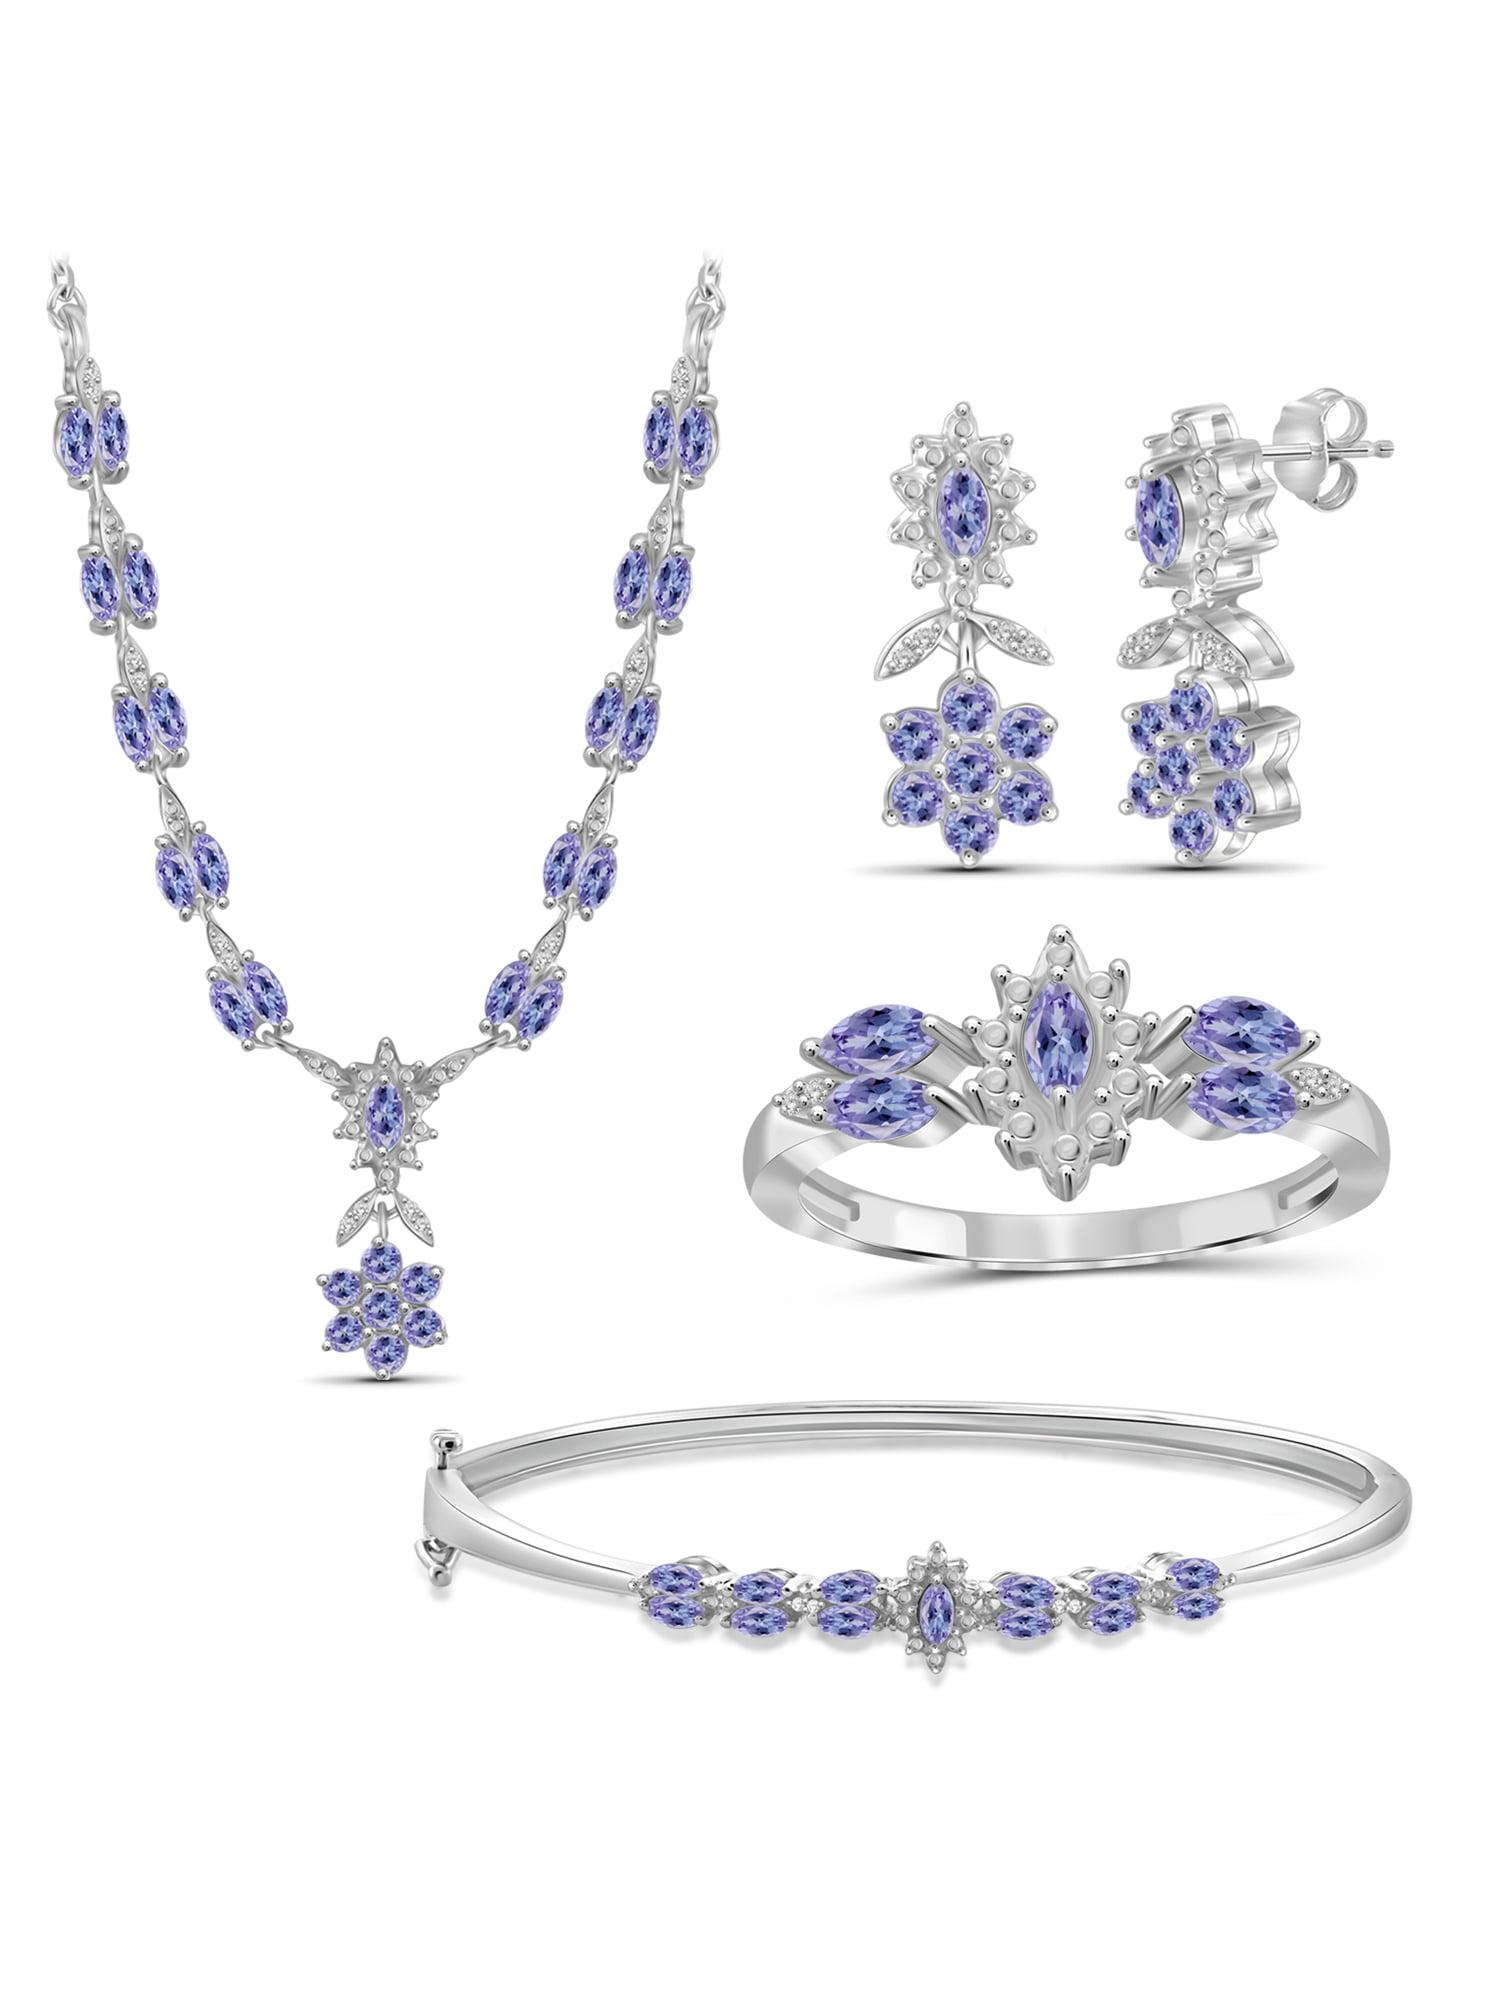 JewelersClub 3 3 4 Carat T.G.W. Tanzanite And White Diamond Accent Sterling Silver 4-Piece Jewelry set by JewelersClub